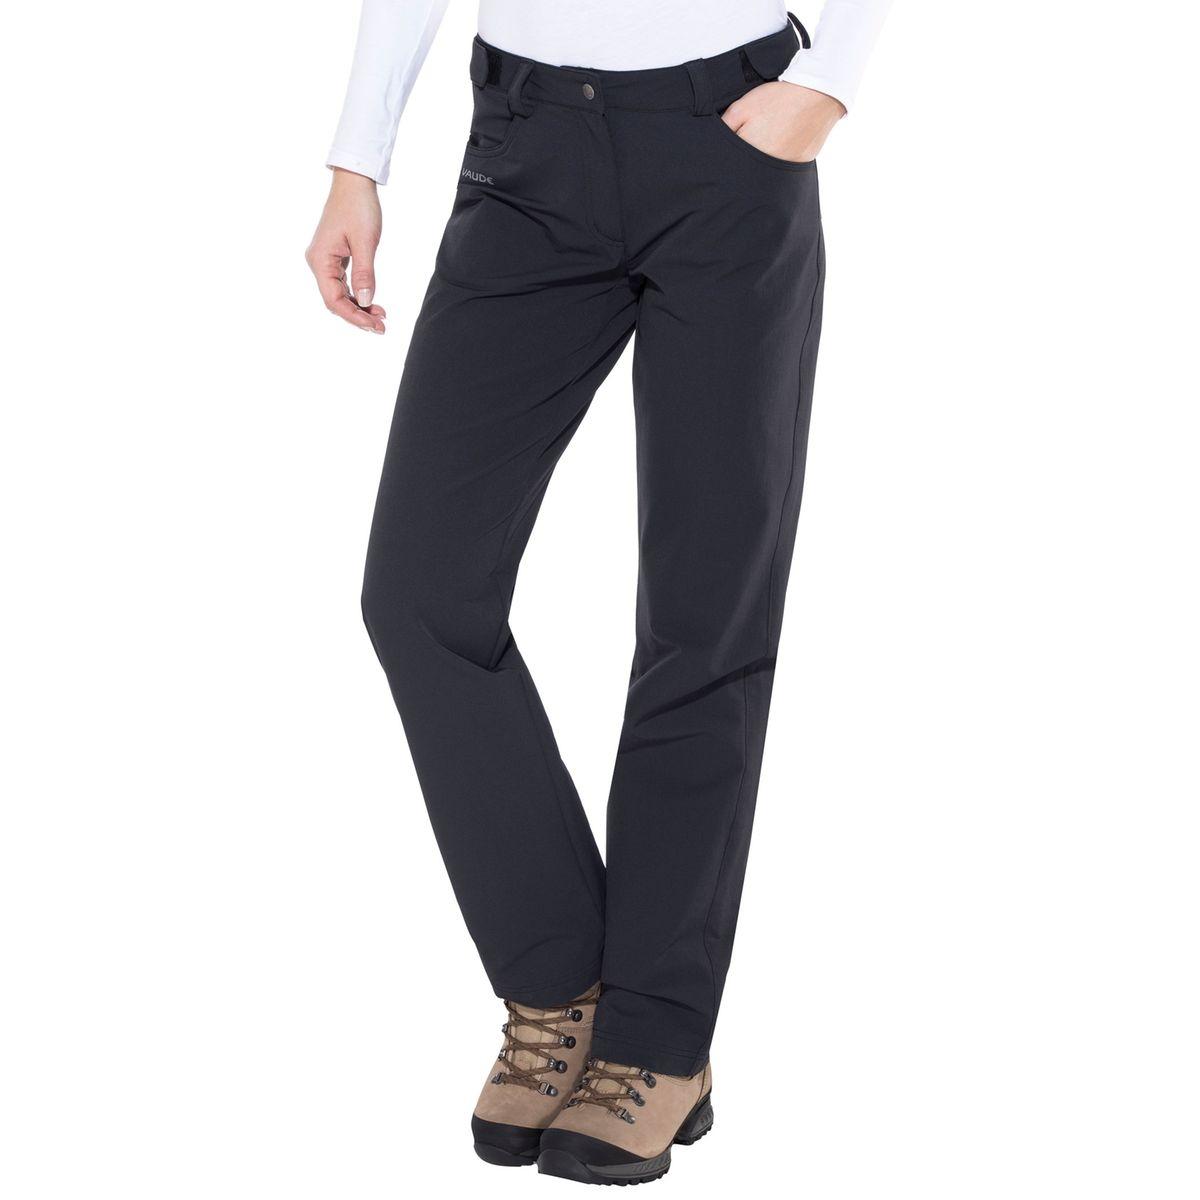 Trenton II - Pantalon Femme - noir